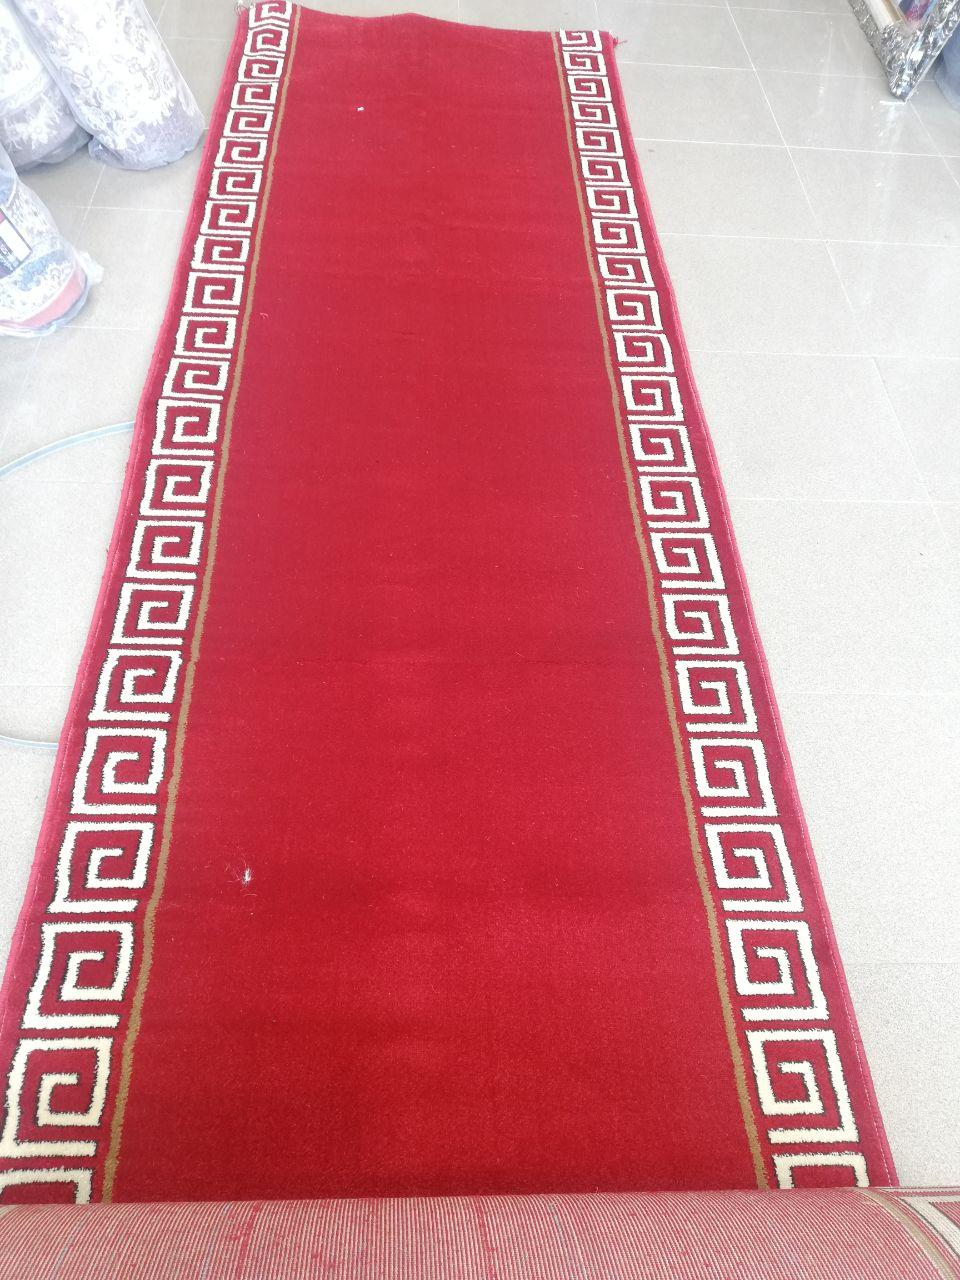 فرش تشریفات و فرش قرمز تشریفاتی